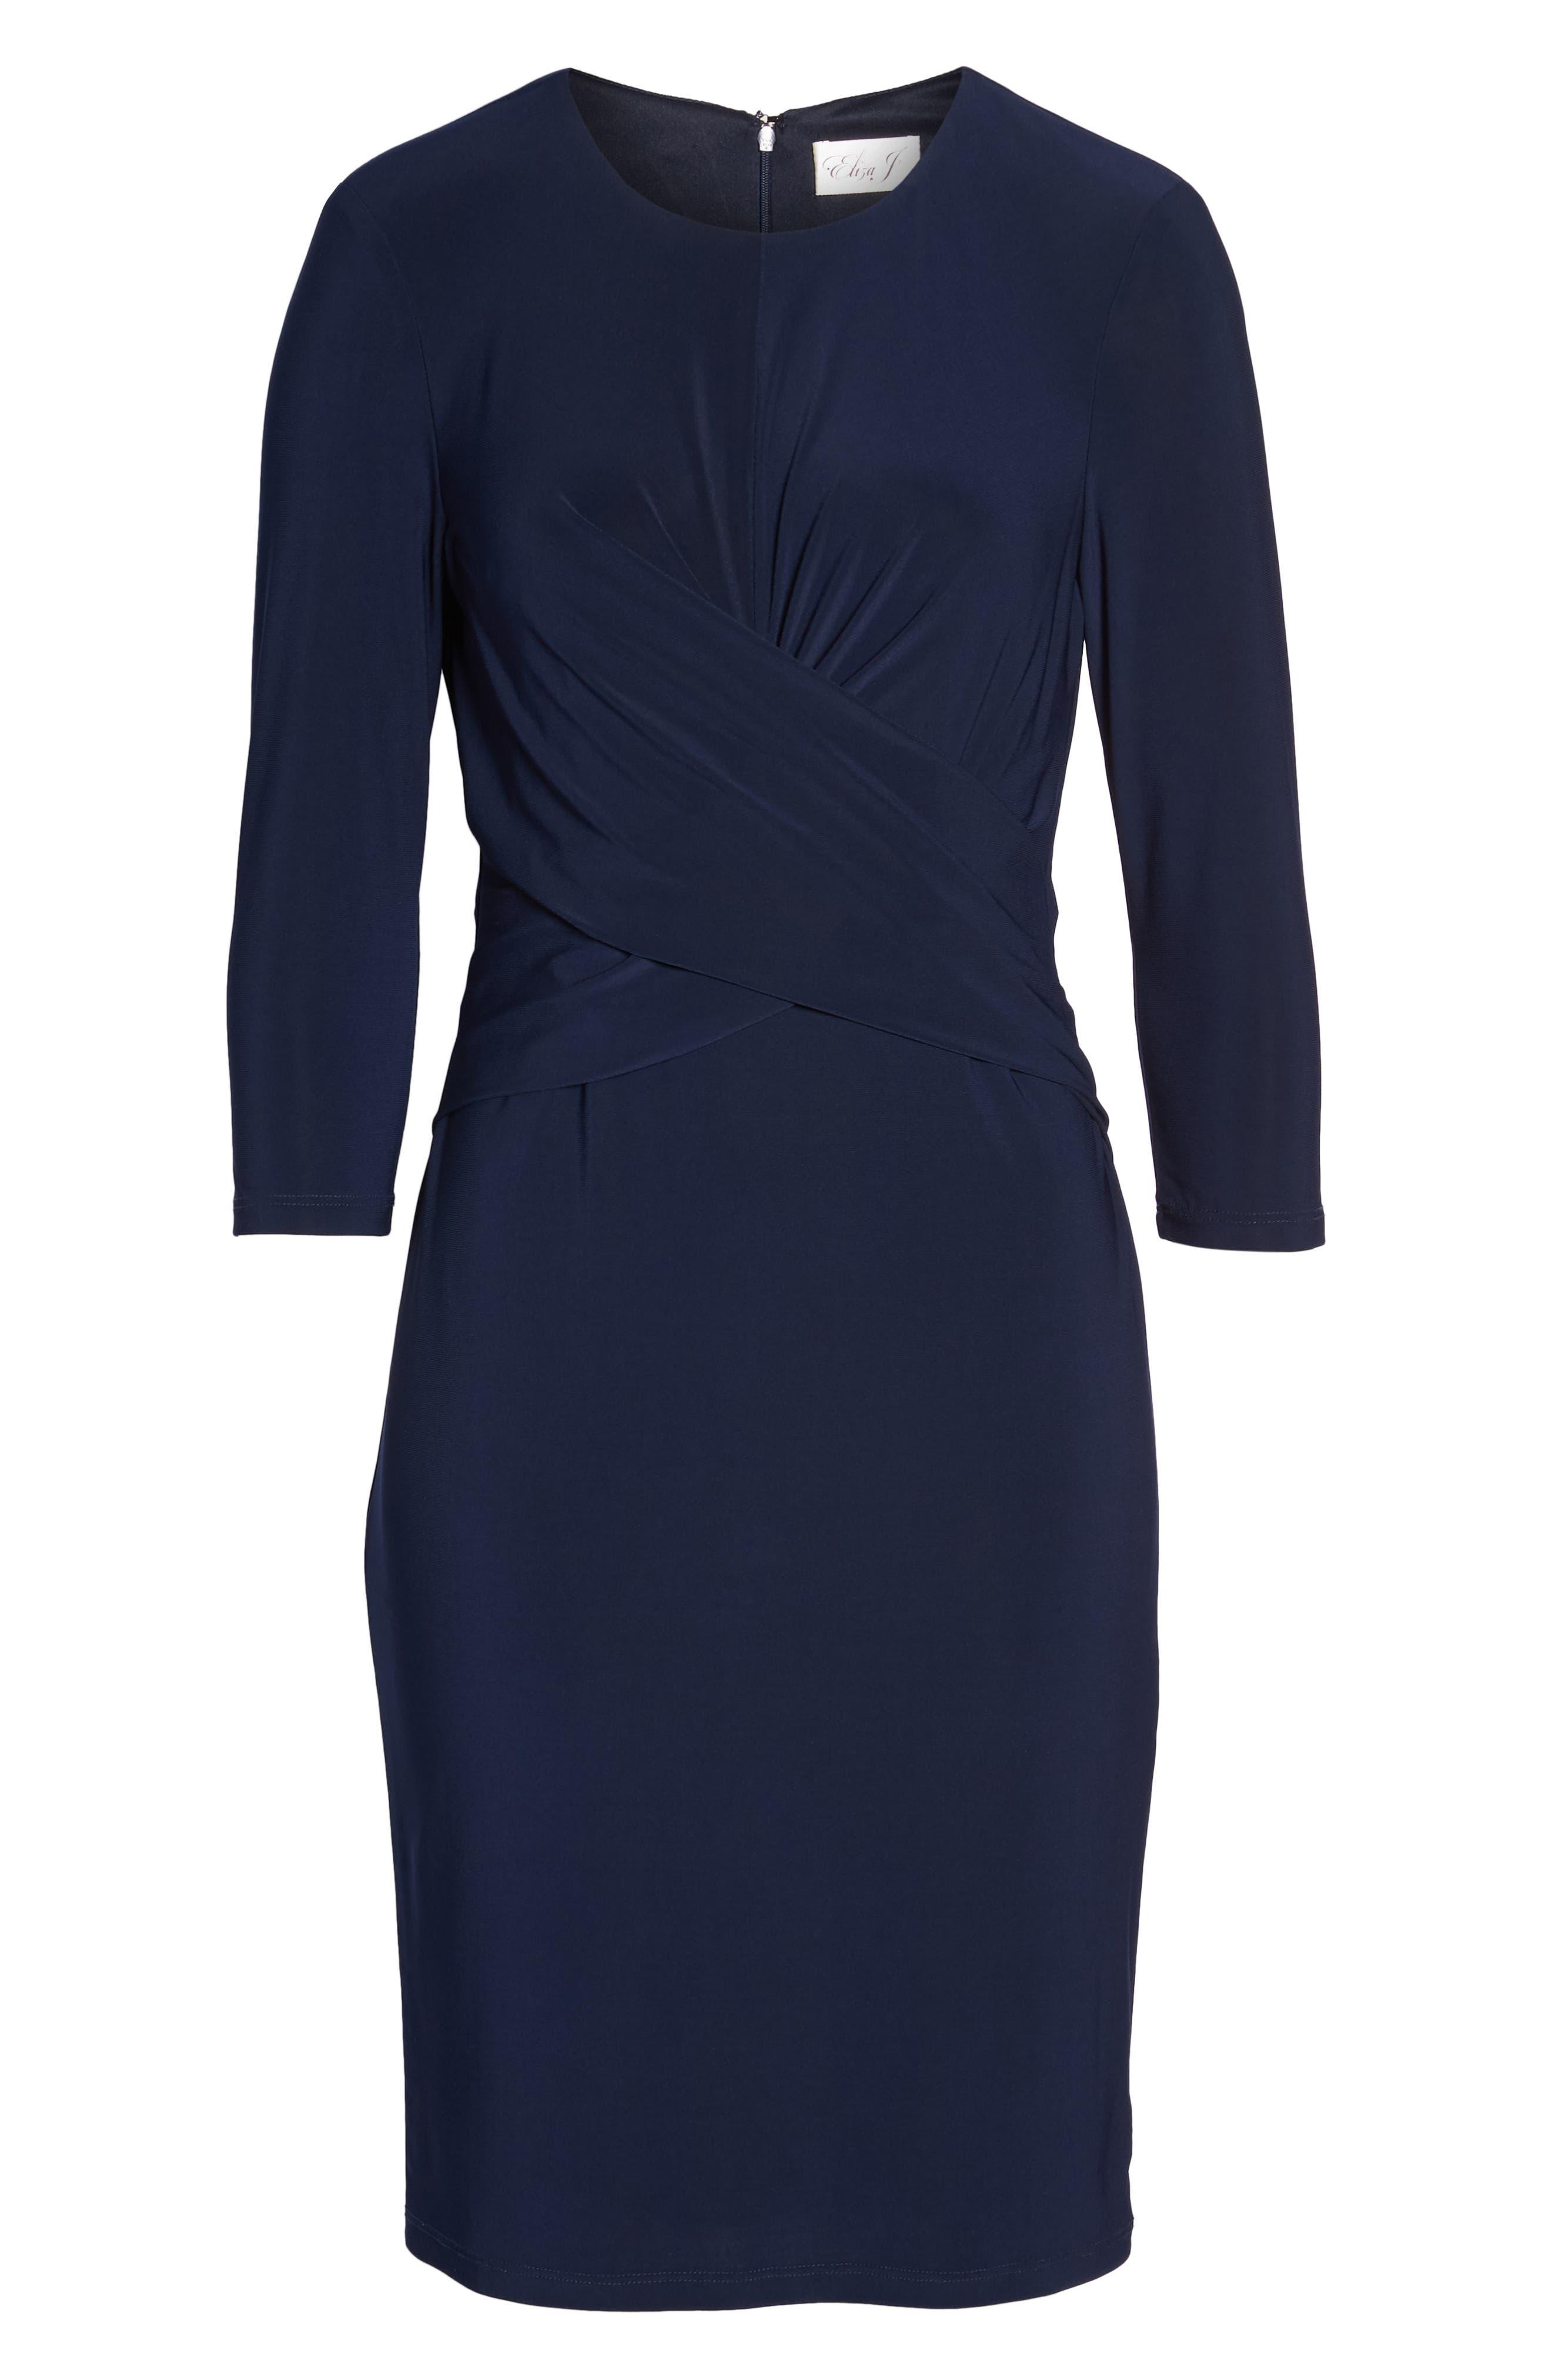 ELIZA J, Ruched Jersey Sheath Dress, Alternate thumbnail 8, color, NAVY